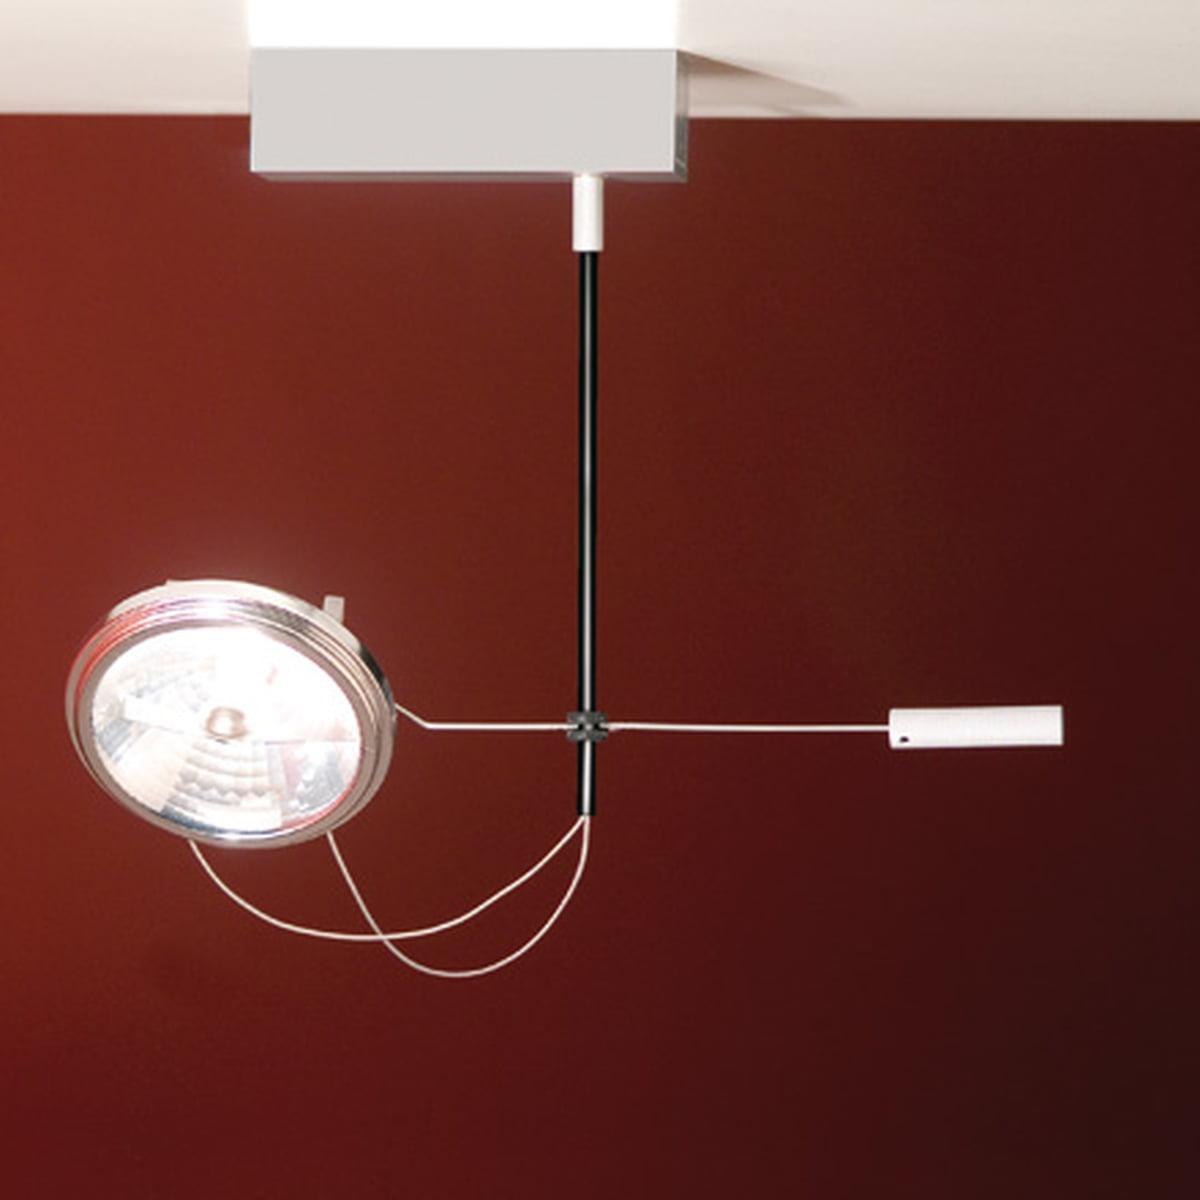 absolut lighting spotlight ceiling lamp. Black Bedroom Furniture Sets. Home Design Ideas